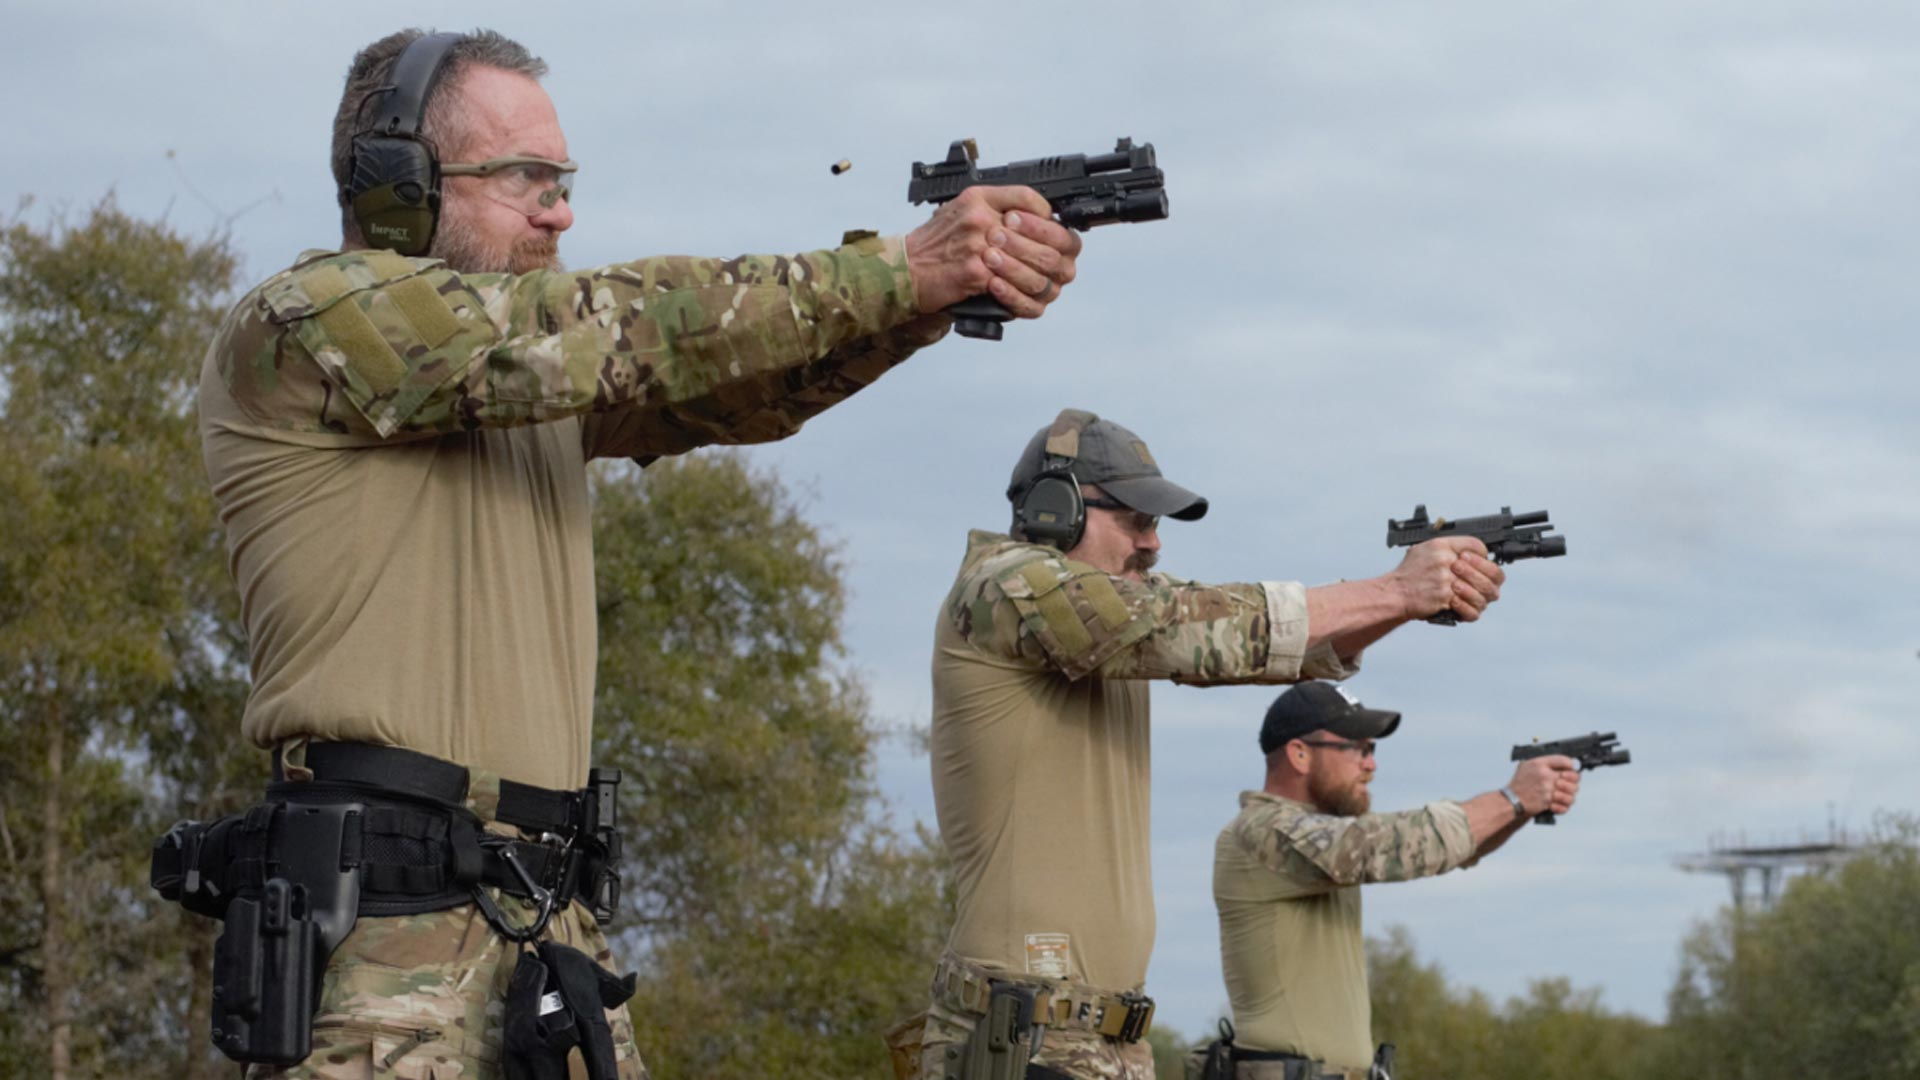 Three men in camouflage firing Staccato handguns at the range